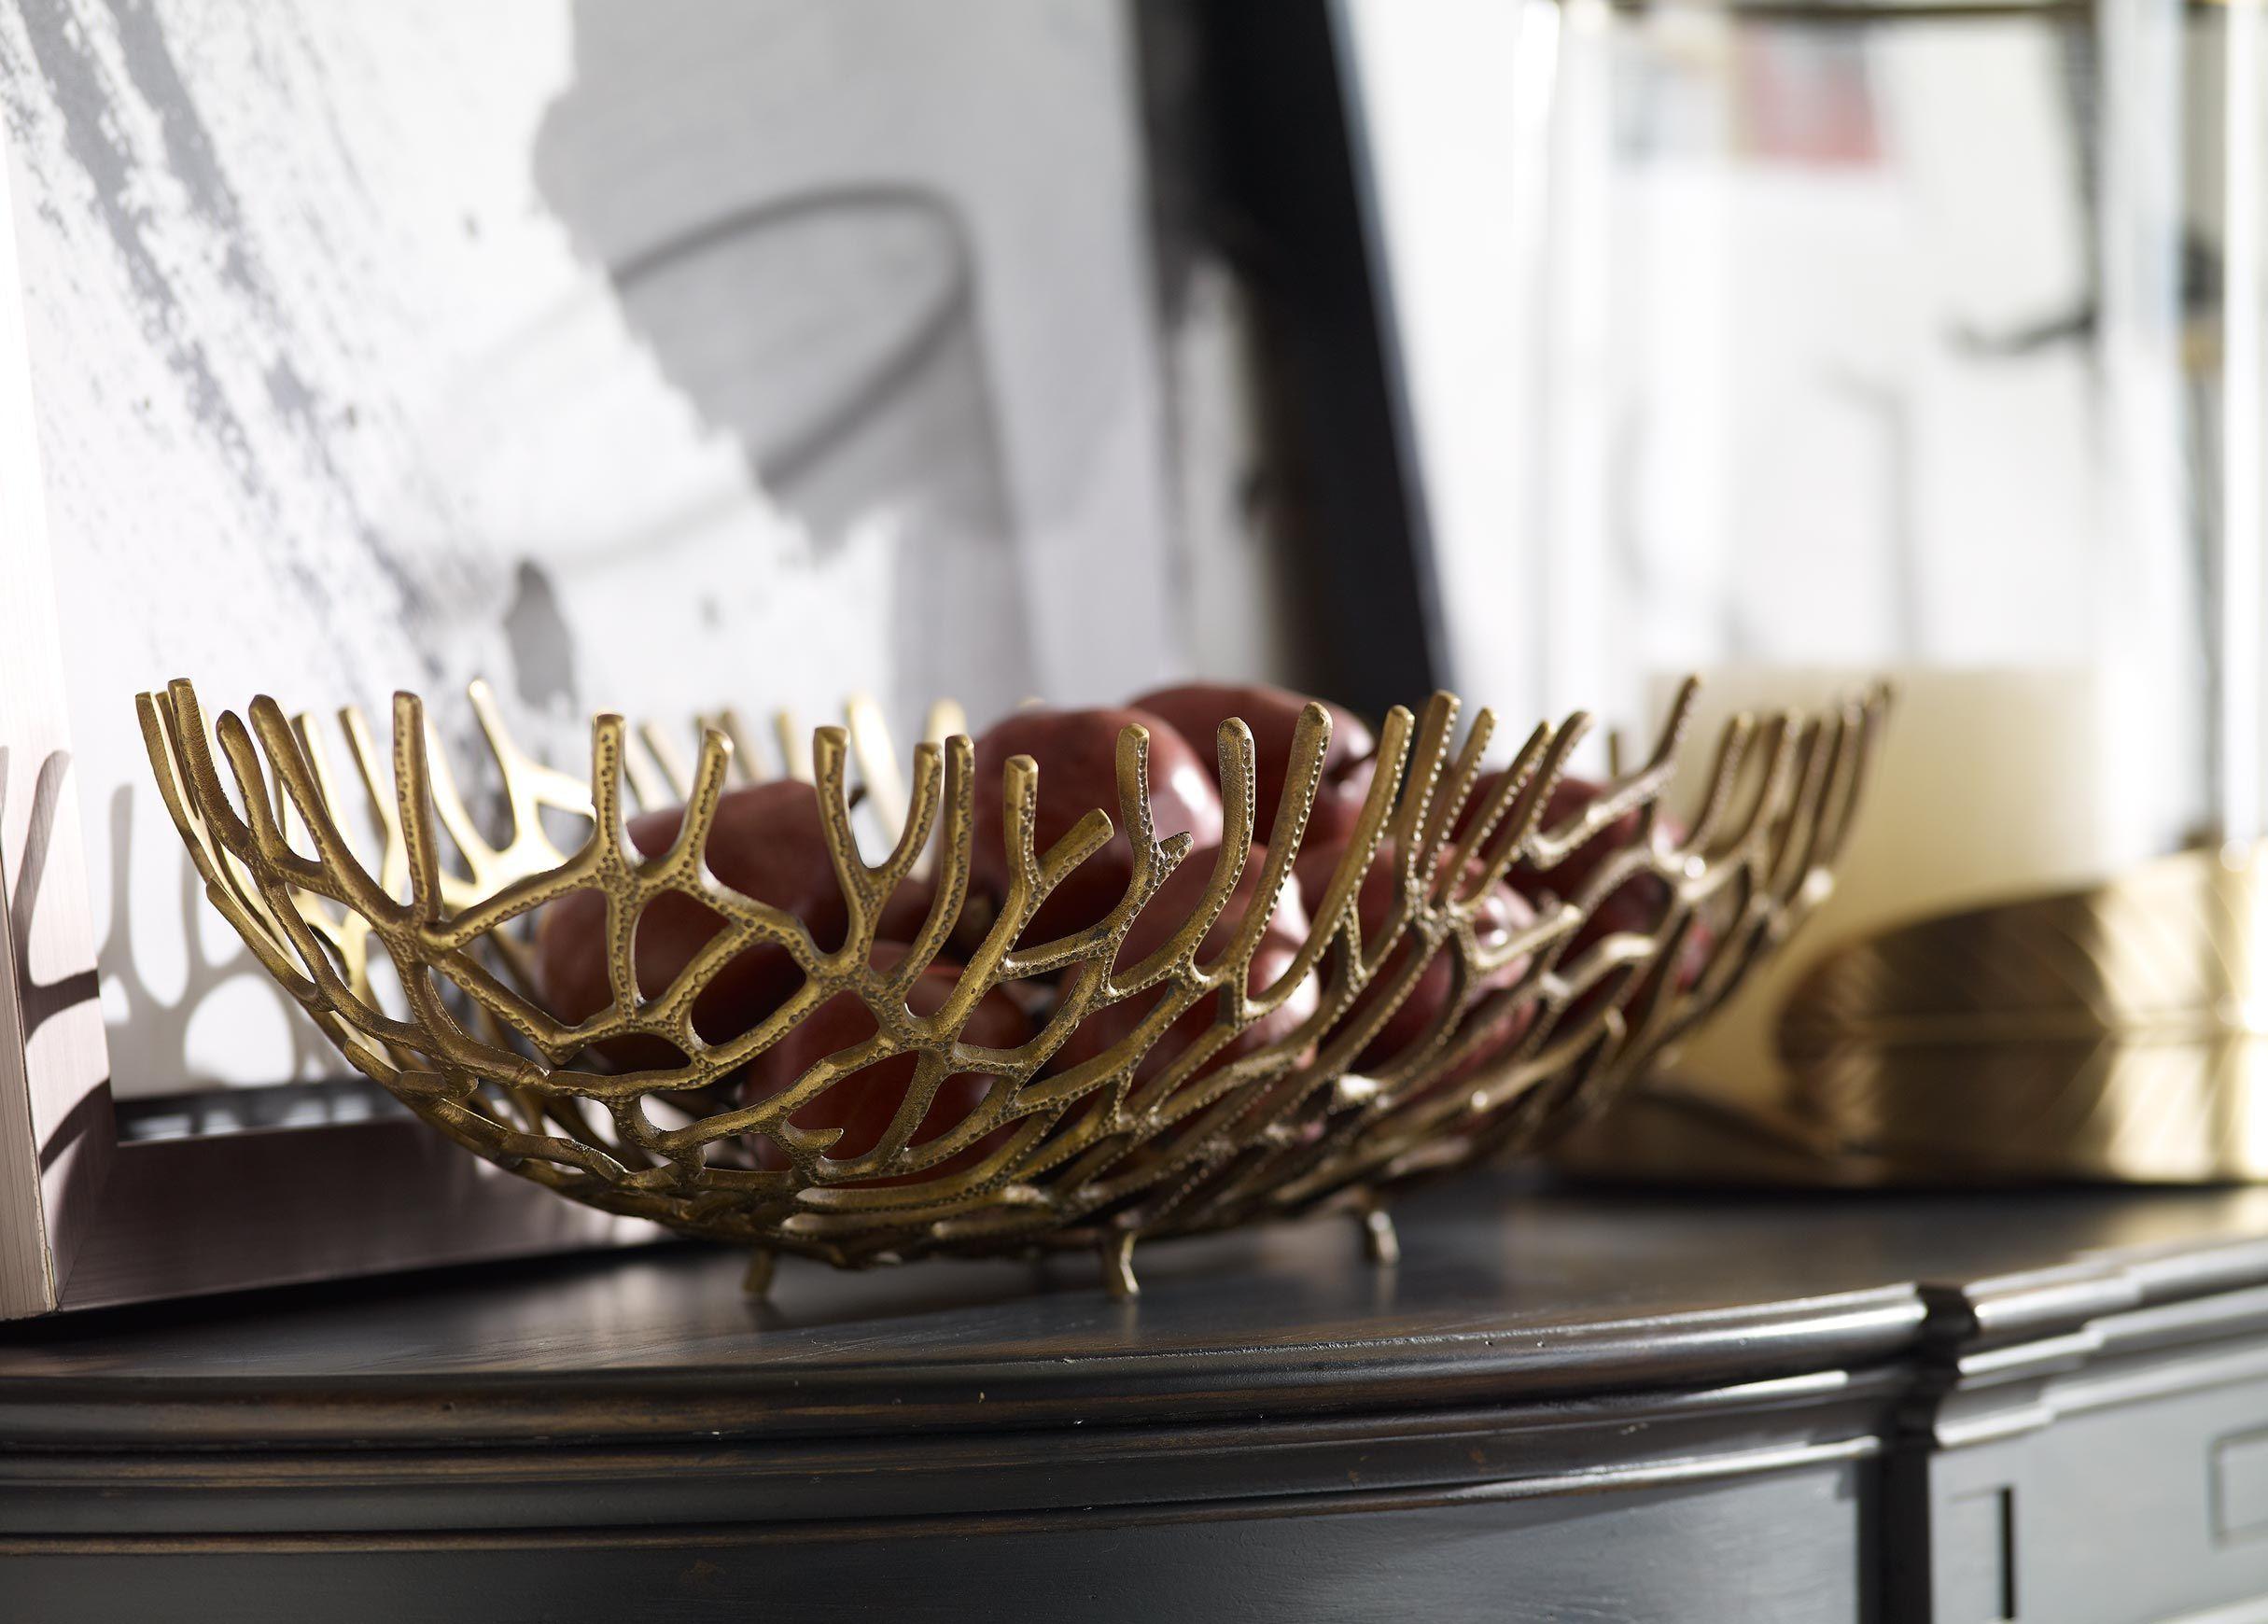 Oval Coral Bowl Decorative Bowls Decor Accent Decor